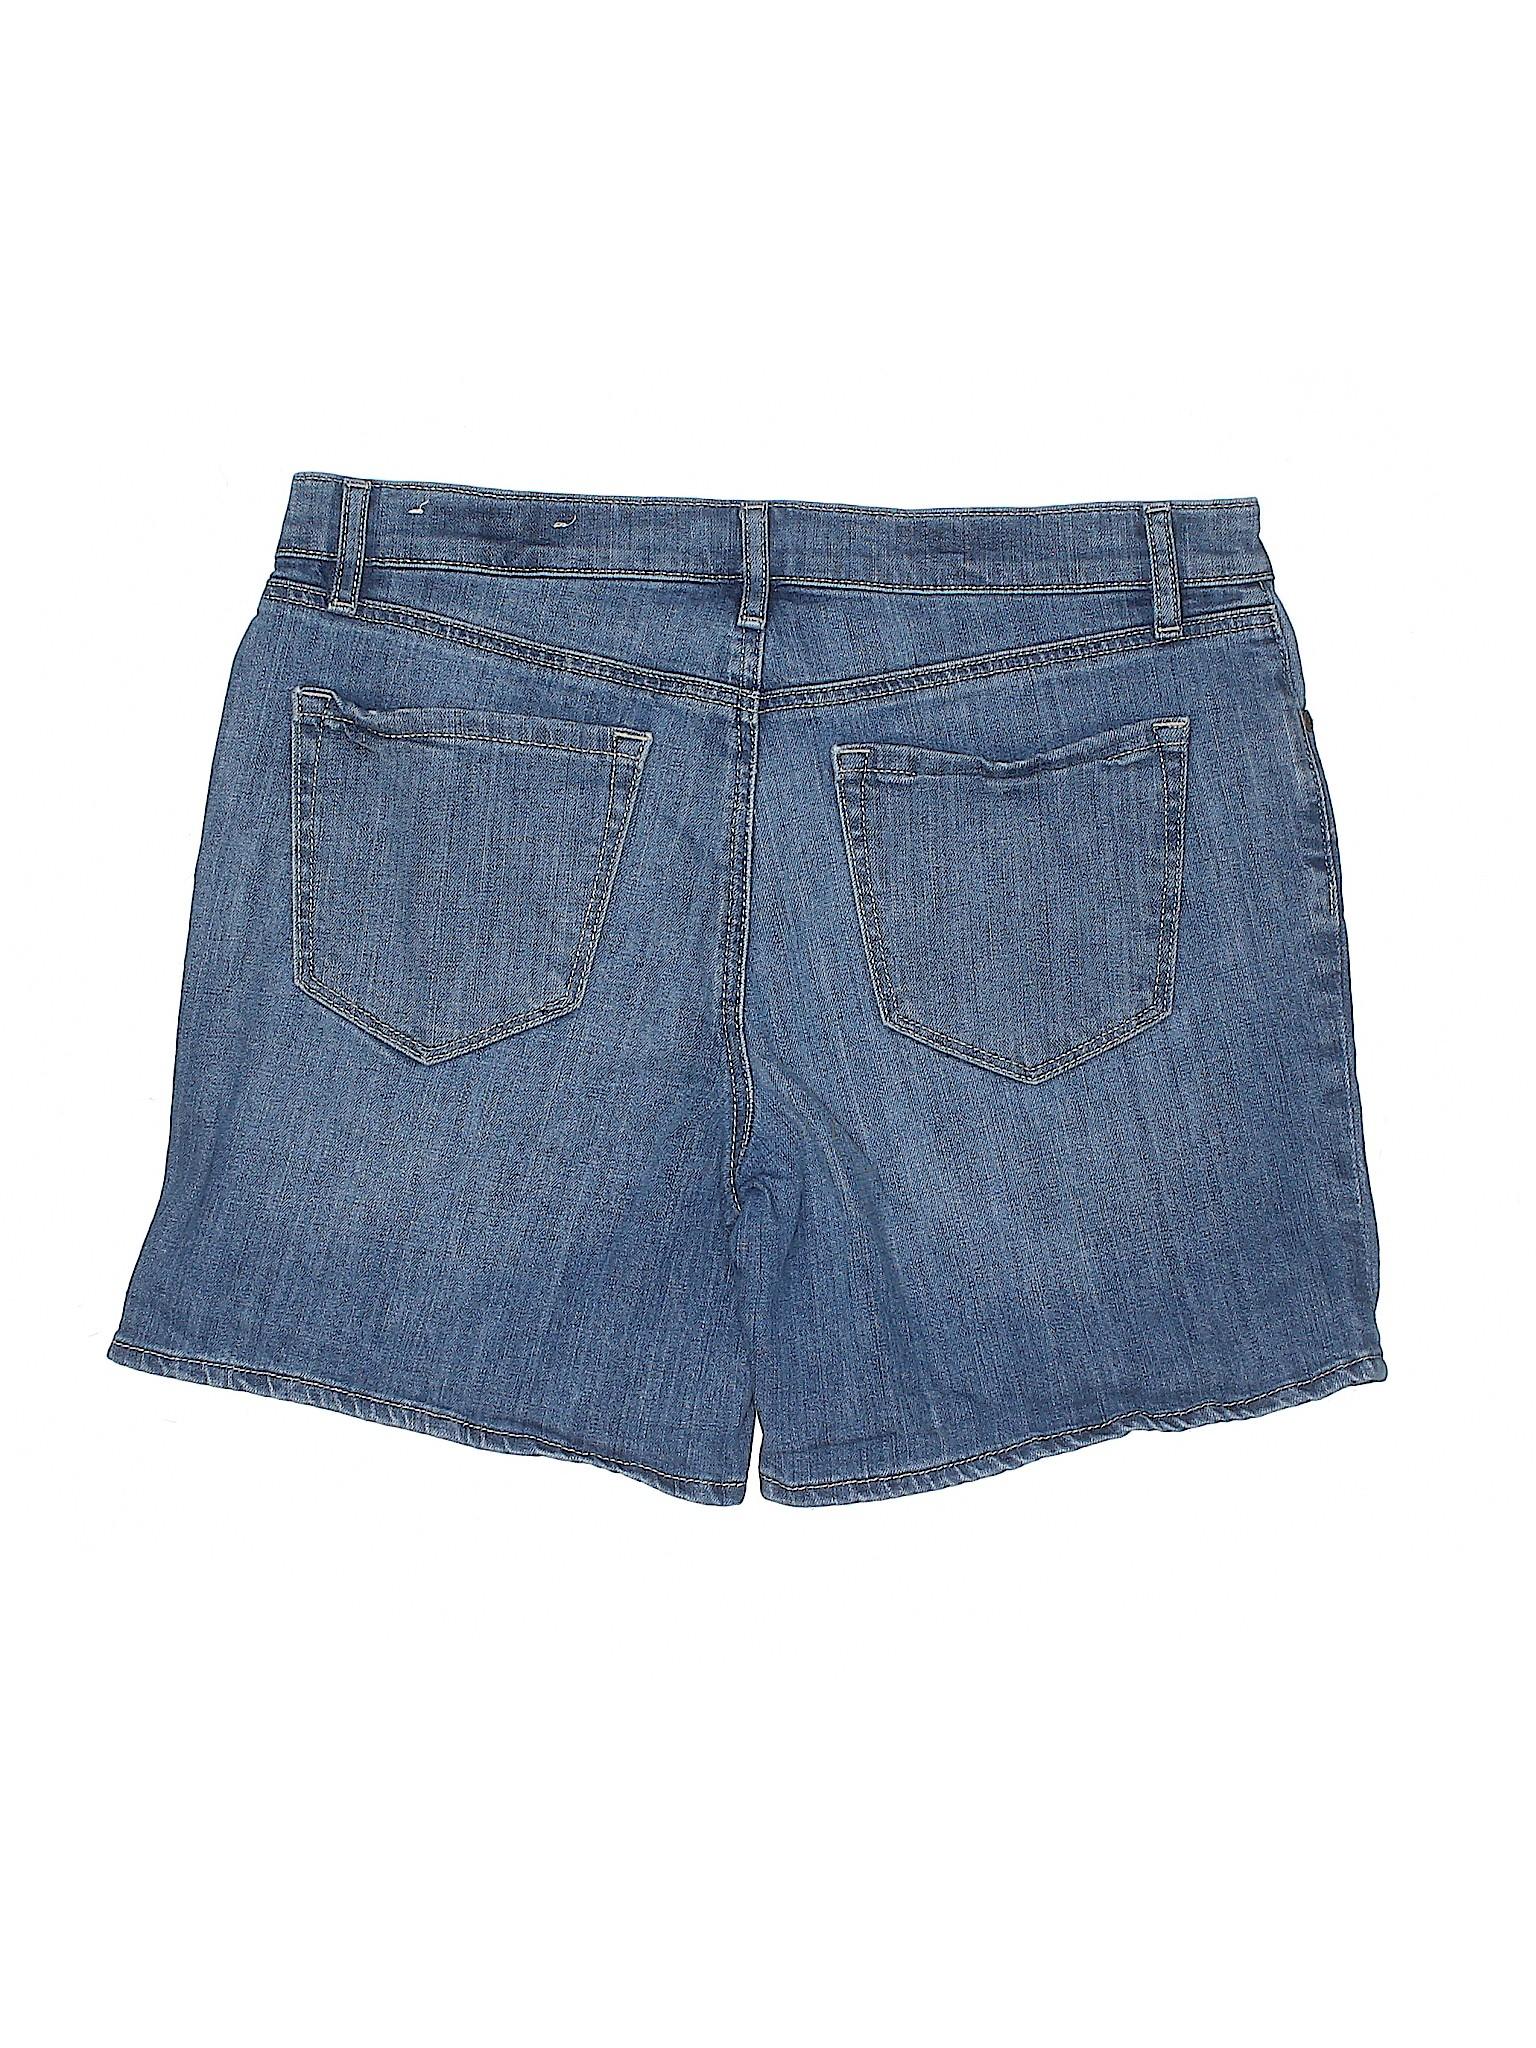 Loft Ann Taylor Leisure Boutique Denim Shorts Bqwn6t85